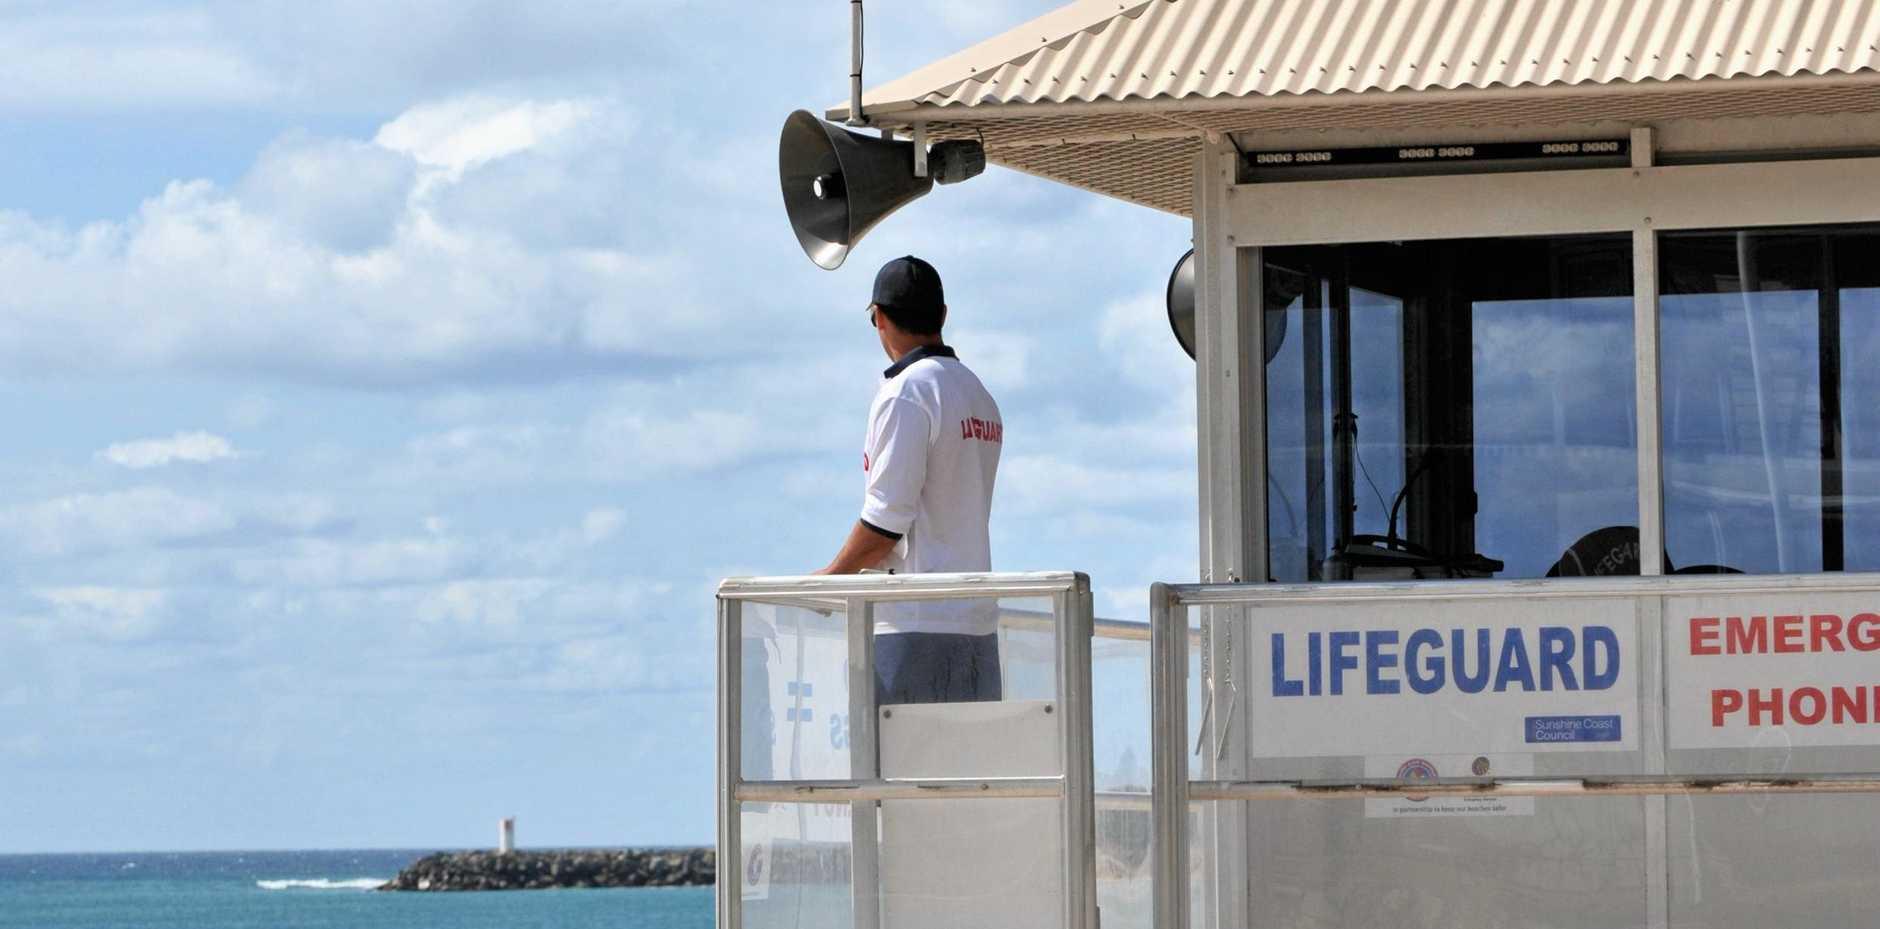 A Sunshine Coast Council Lifeguard keeps a watch over Mooloolaba Beach. Photo: Brett Wortman / Sunshine Coast Daily